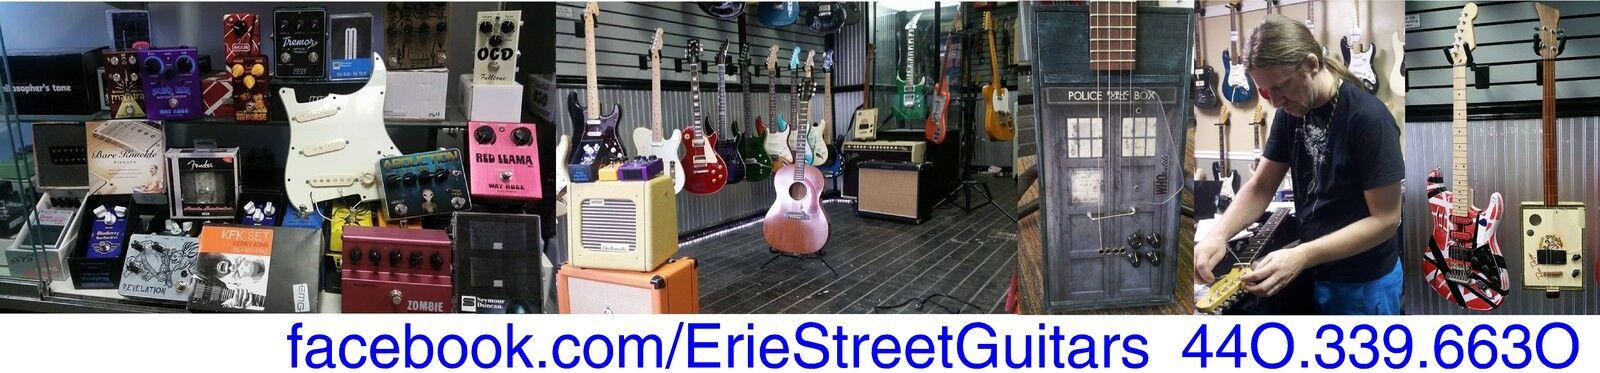 Erie Street Guitars